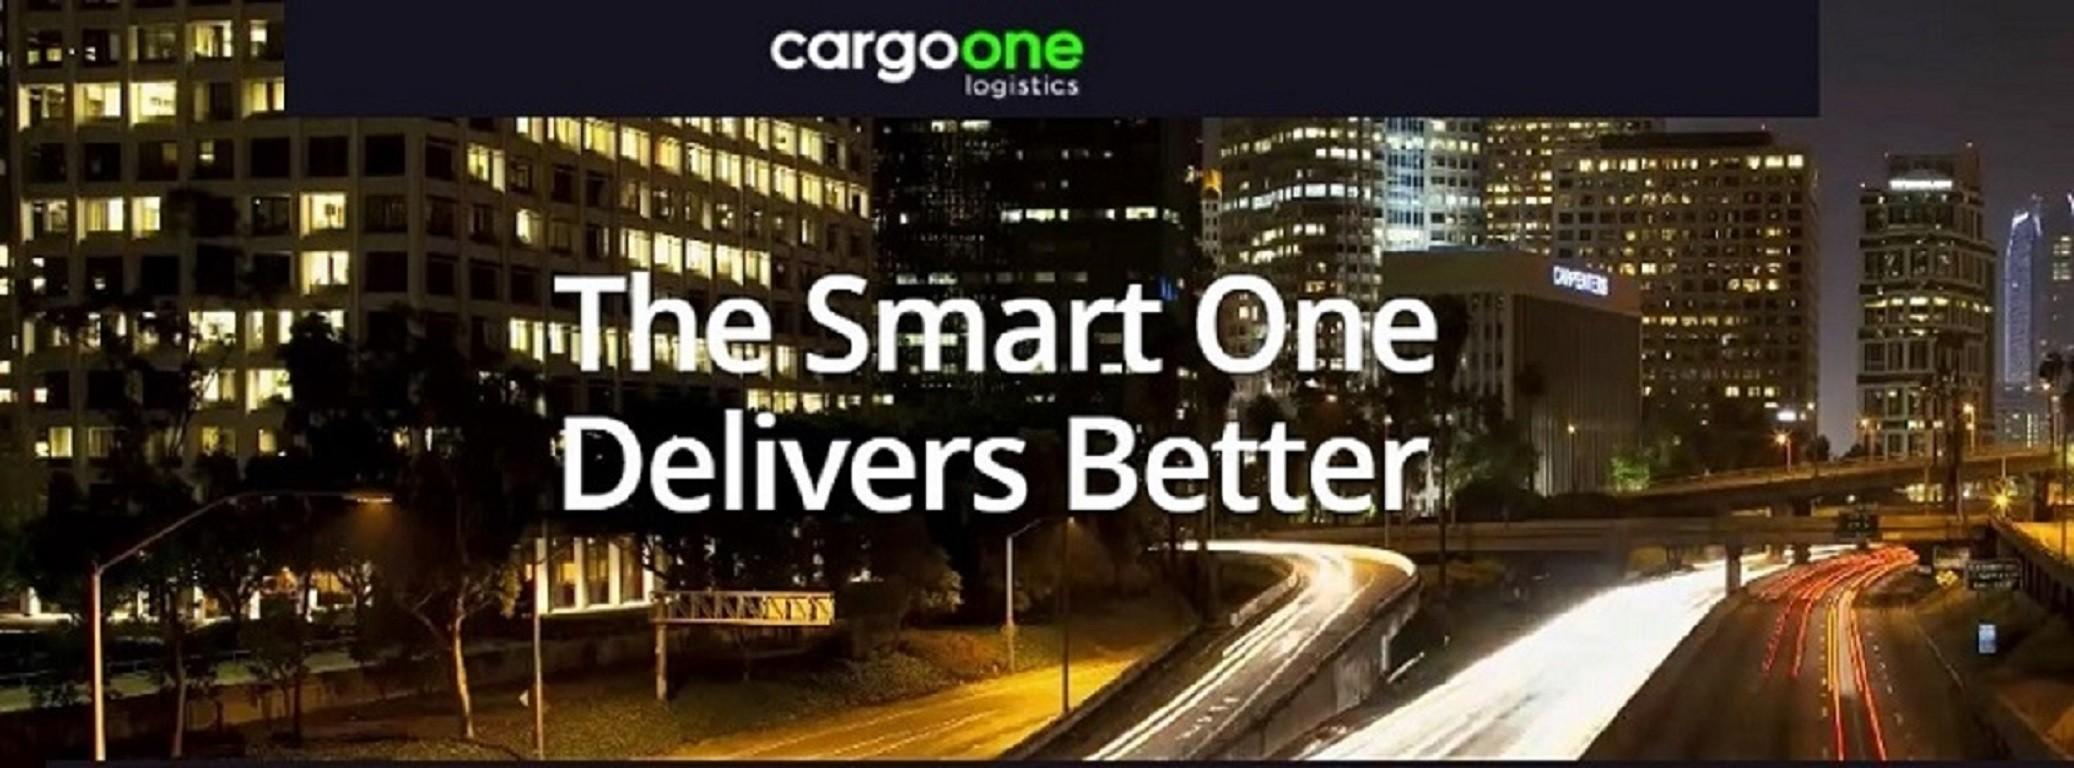 Cargo One Logistics | LinkedIn